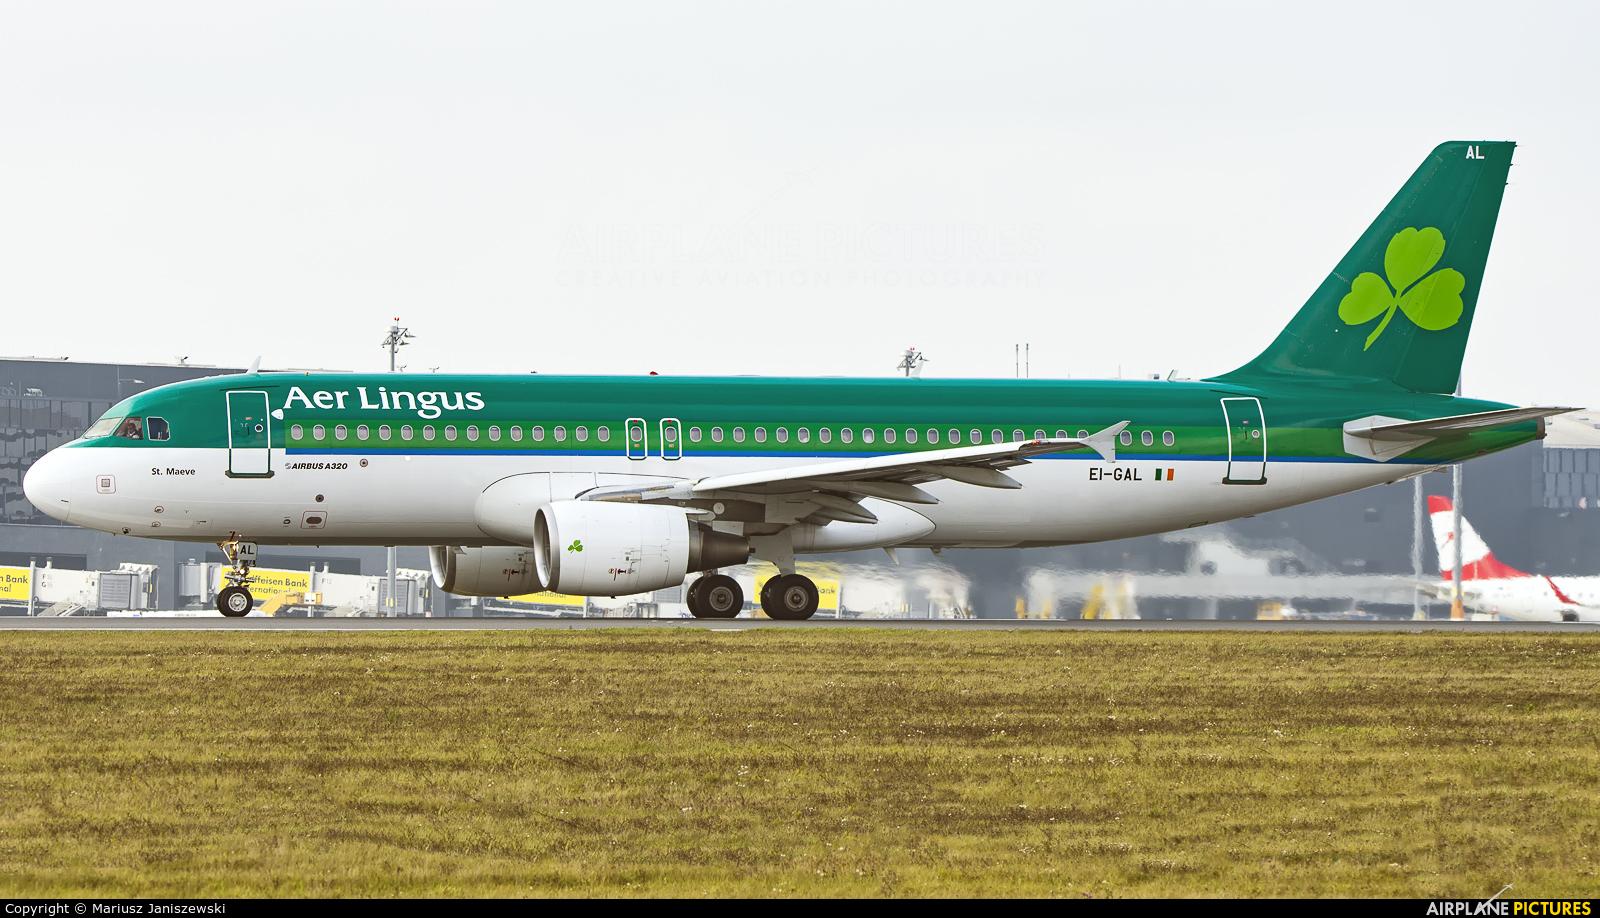 Aer Lingus EI-GAL aircraft at Vienna - Schwechat